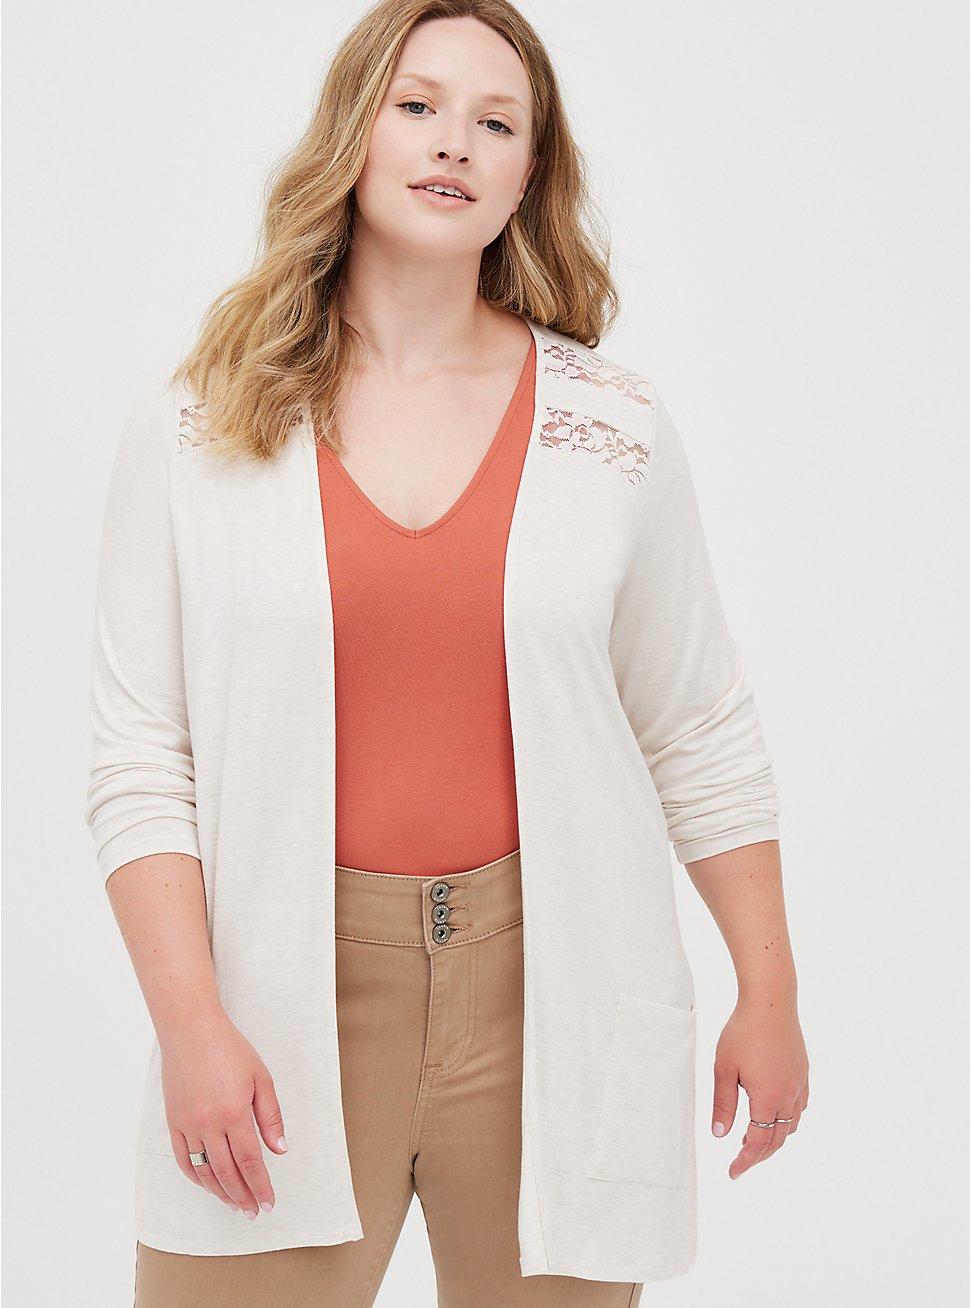 Lace Cardigan - Super Soft Oatmeal, OATMEAL HEATHER, hi-res